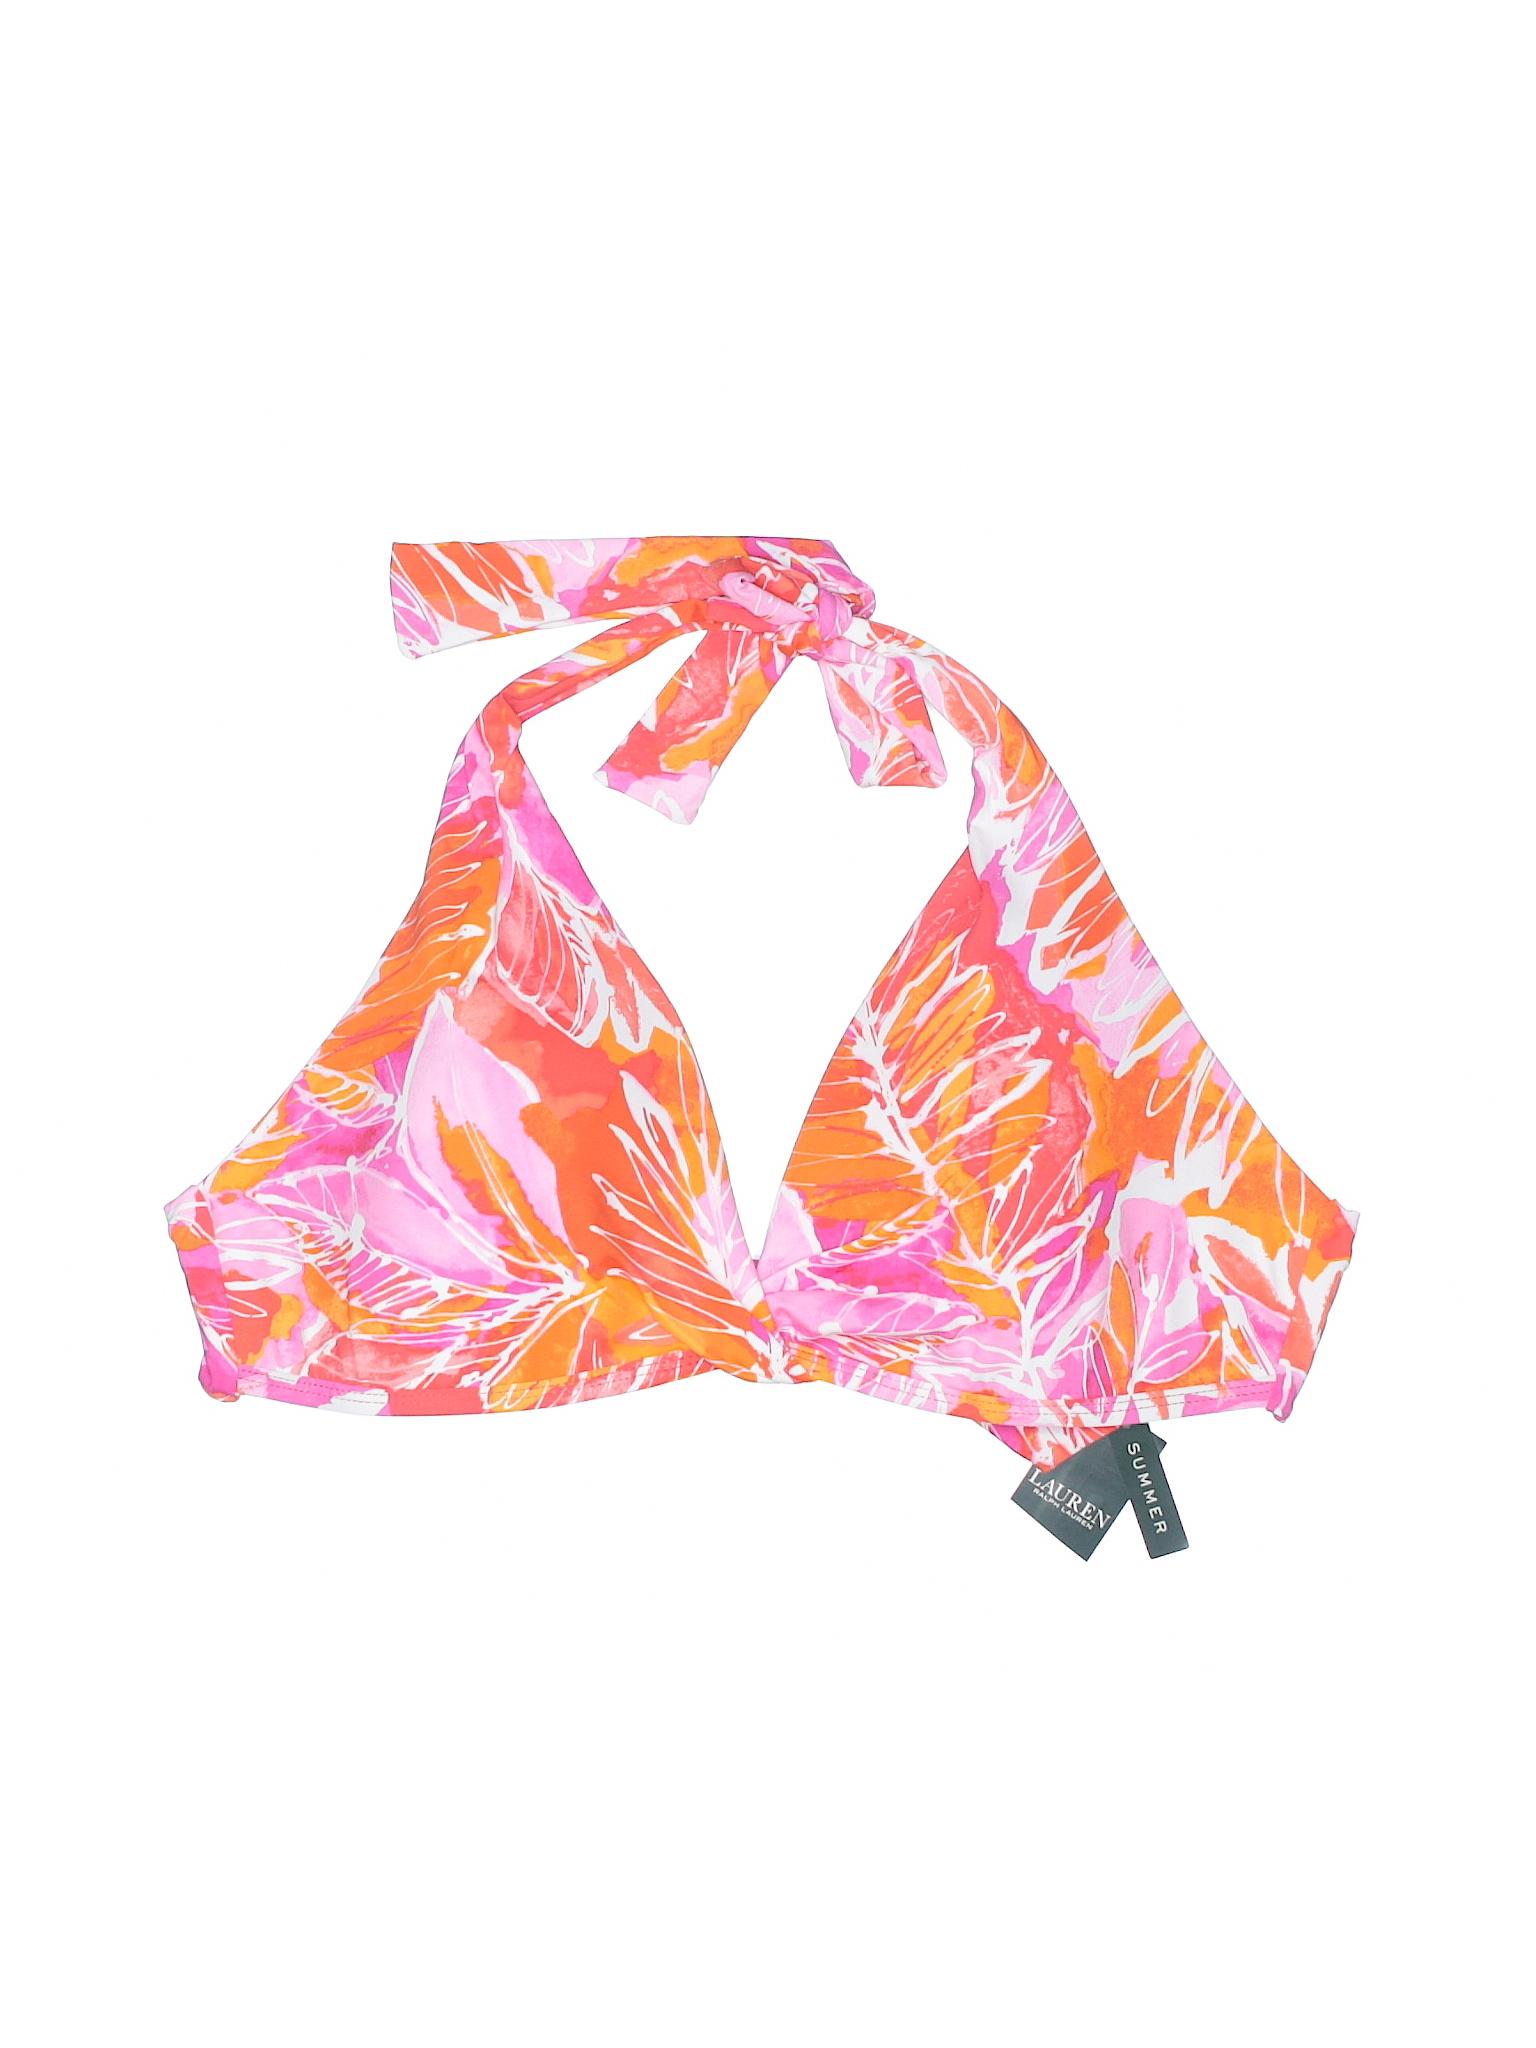 Lauren Swimsuit by Boutique Top Lauren Ralph ZqdvxTwHI